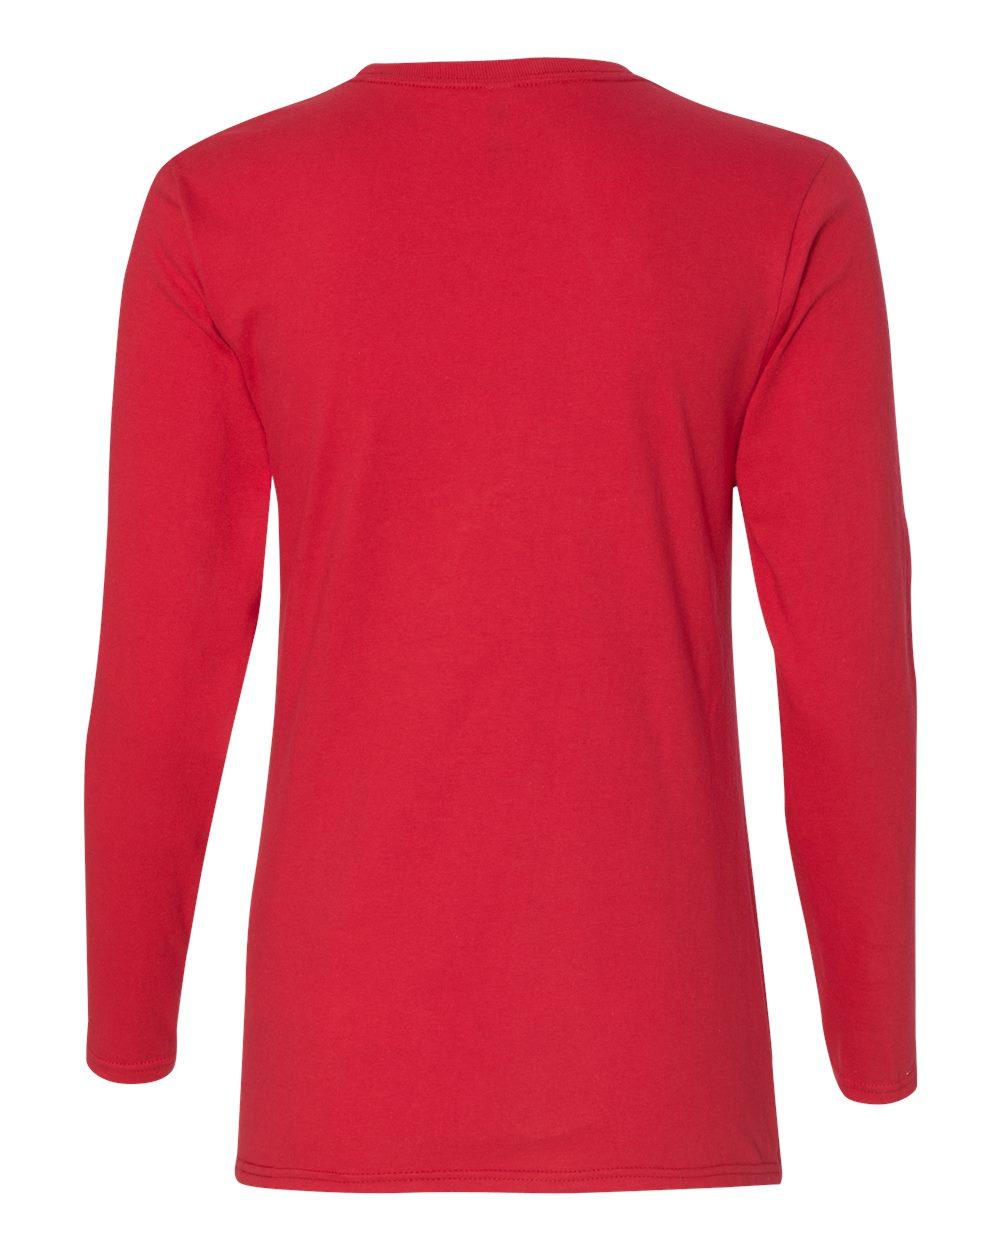 Anvil-Womens-Lightweight-Long-Sleeve-T-Shirt-884L-Size-S-2XL thumbnail 26